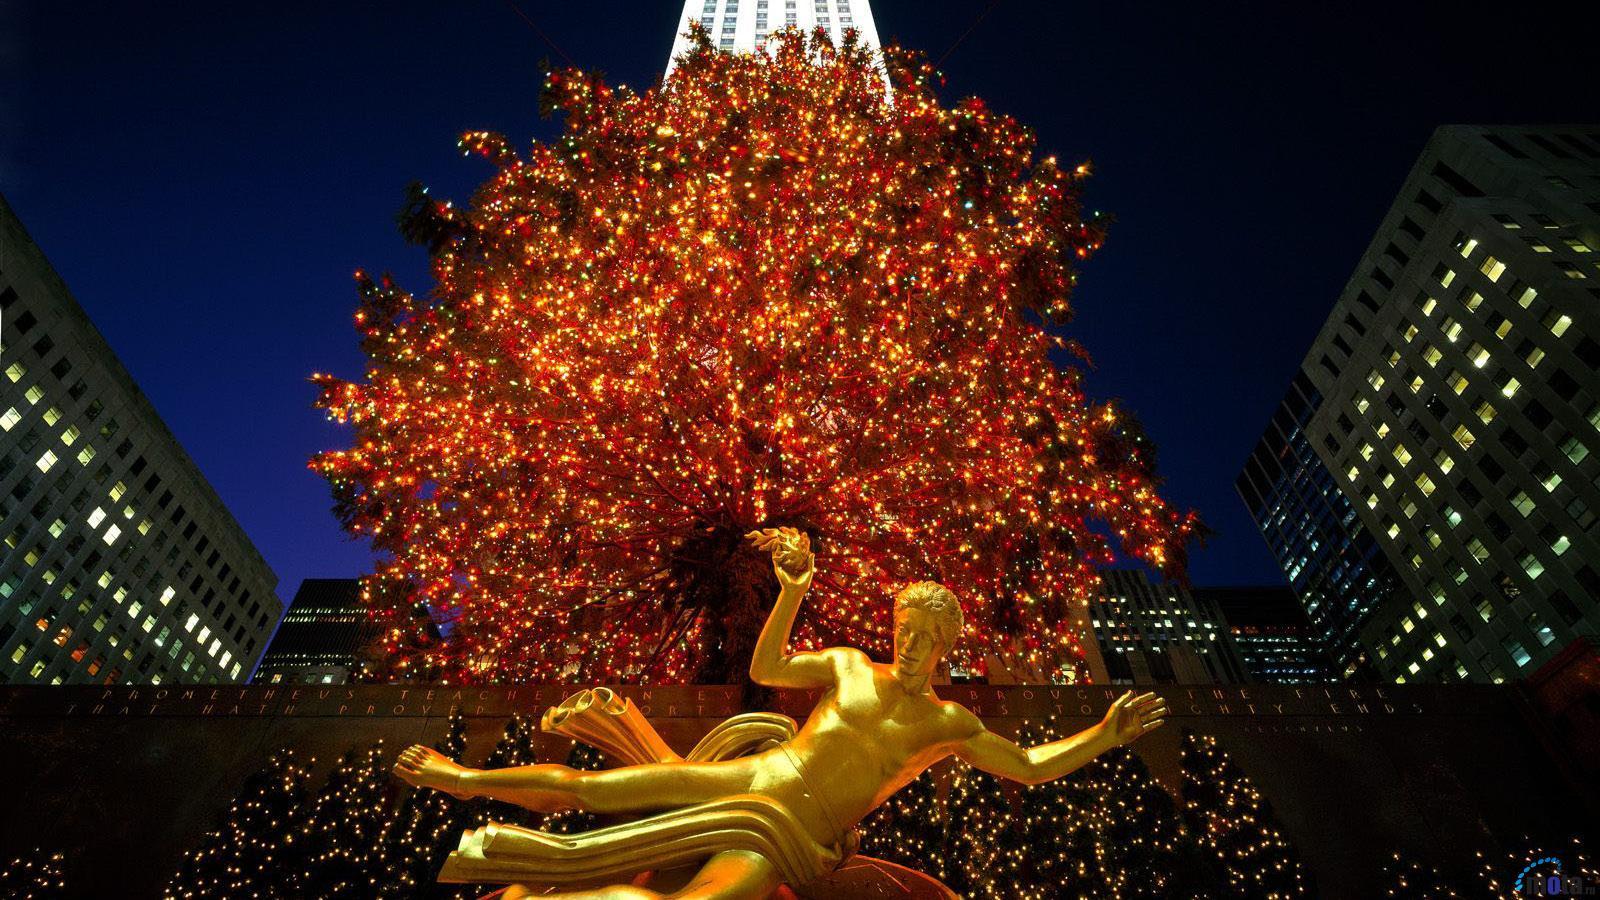 Desktop wallpapers Christmas in Rockefeller Center New York 1600x900